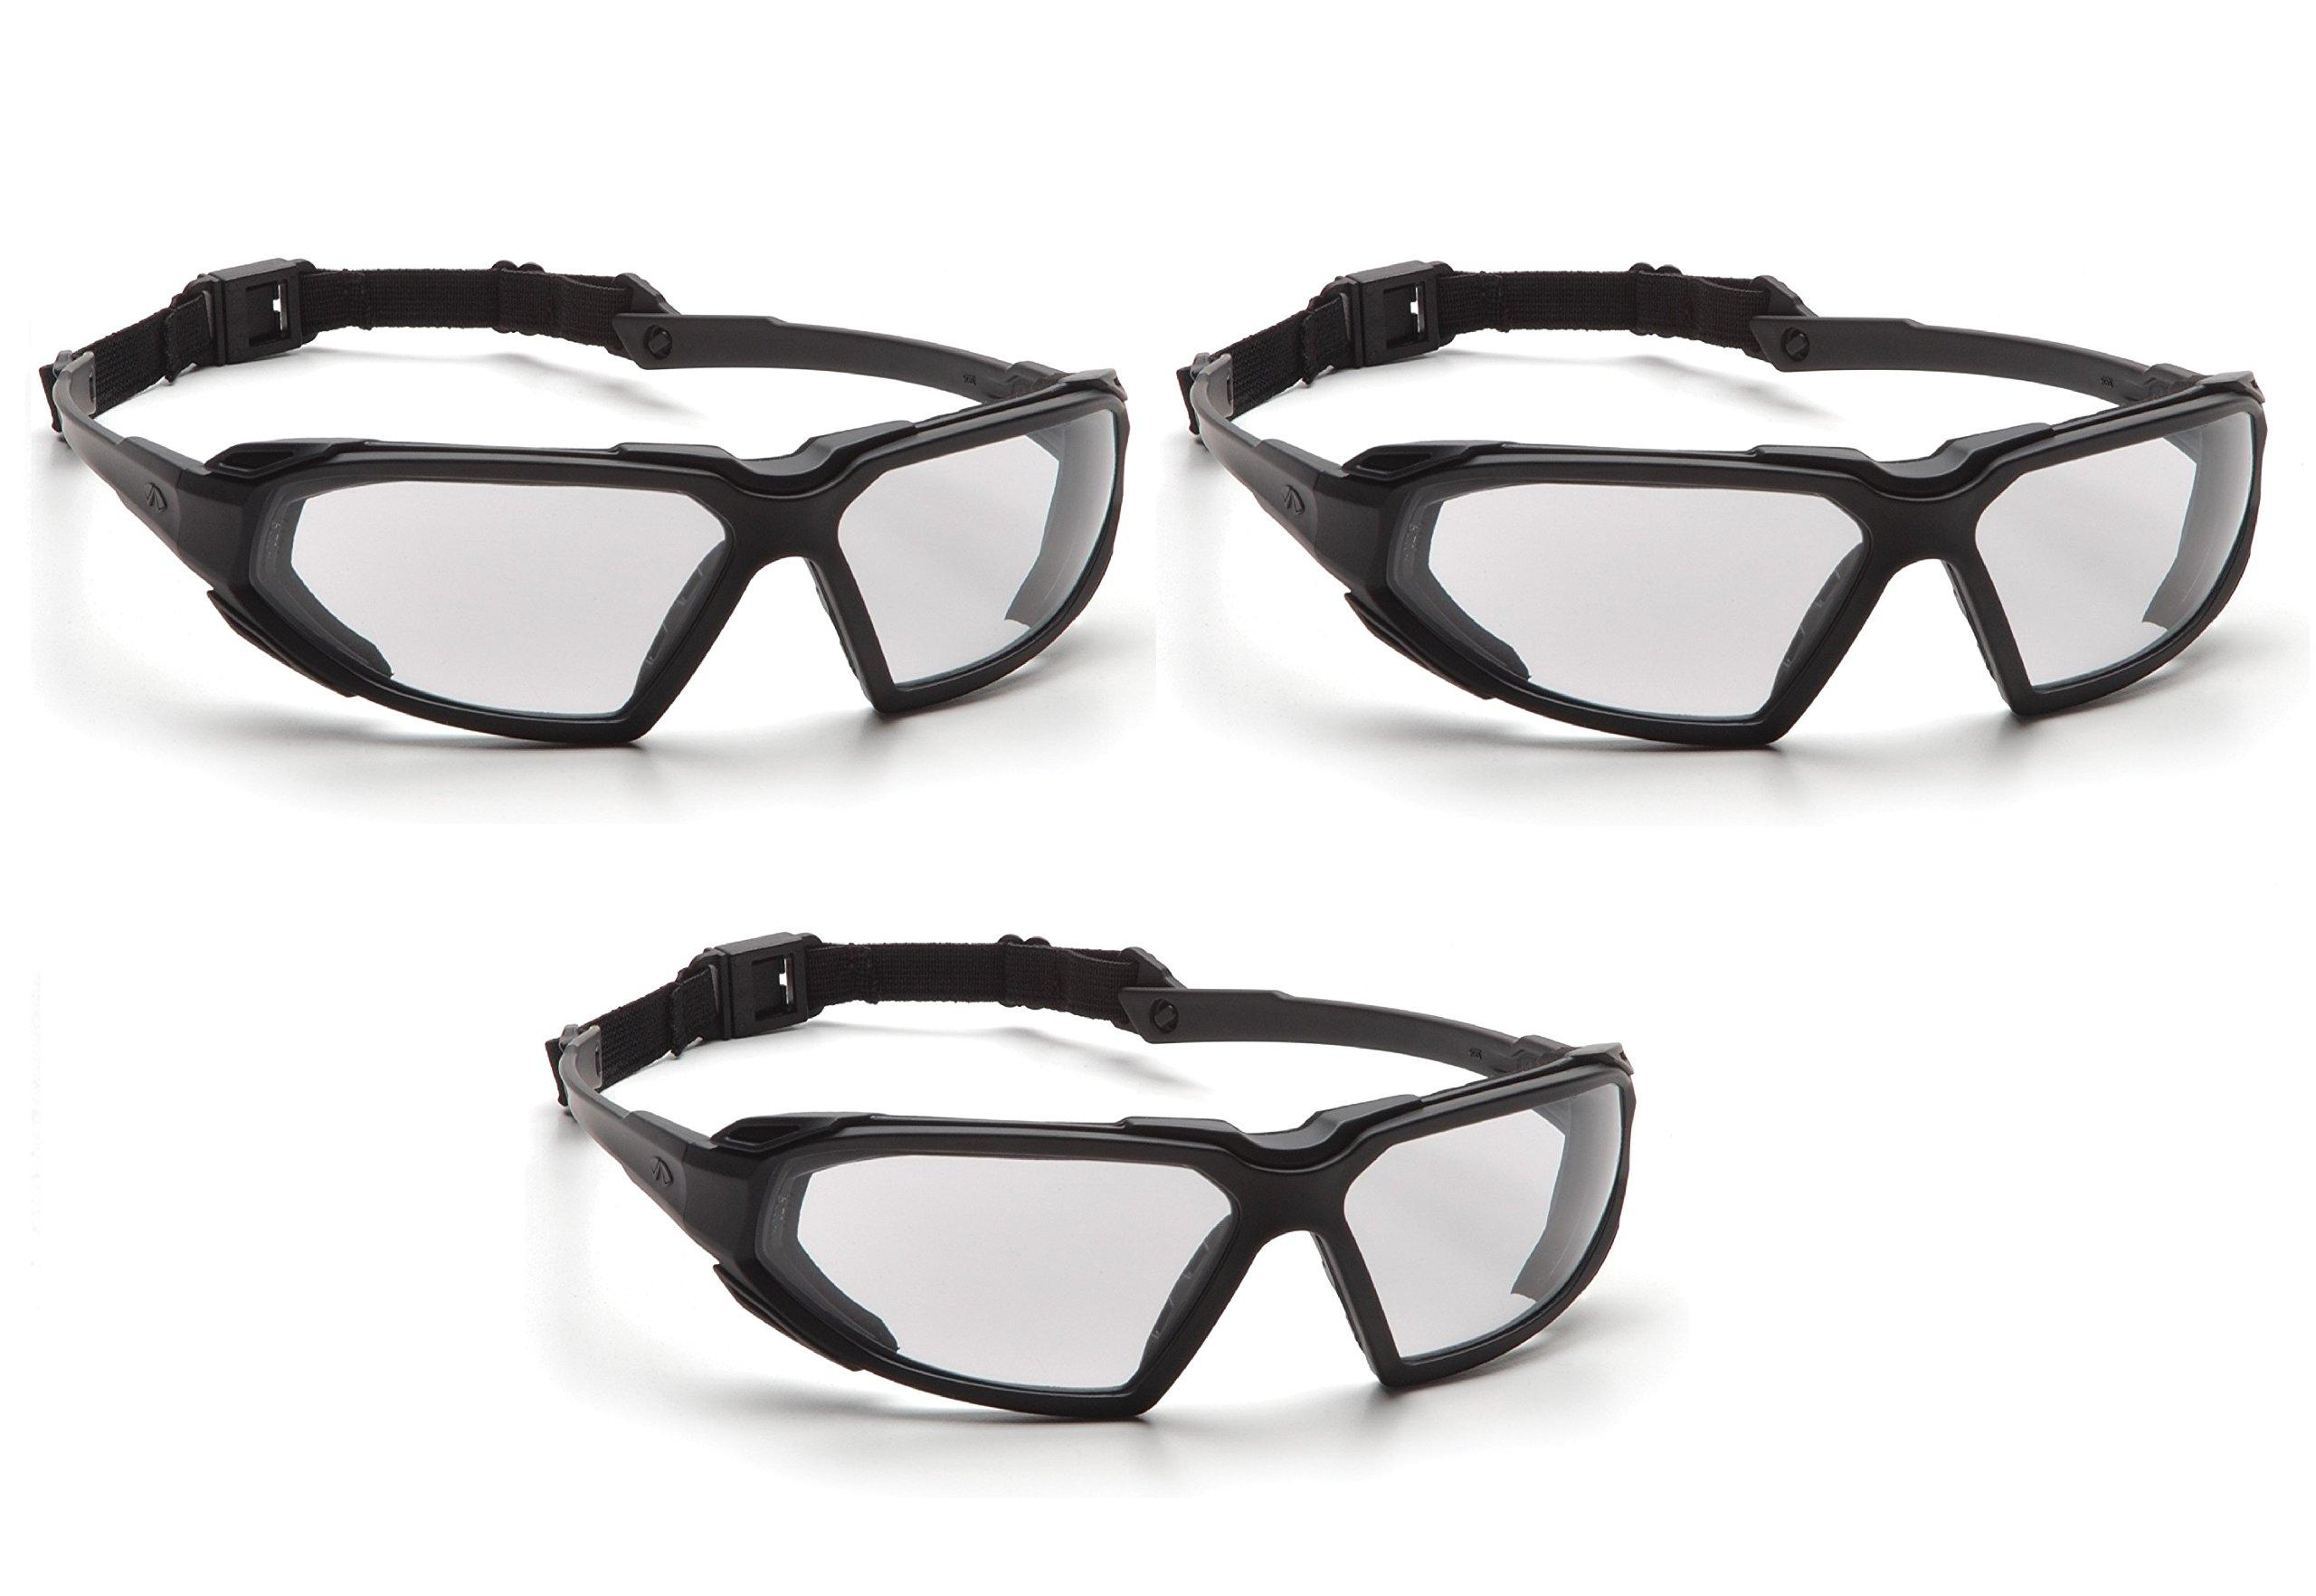 Highlander Pyramex Safety Eyewear (Black Frame/Clear Anti-Fog Lens) (3 Pair Pack) by Highlander